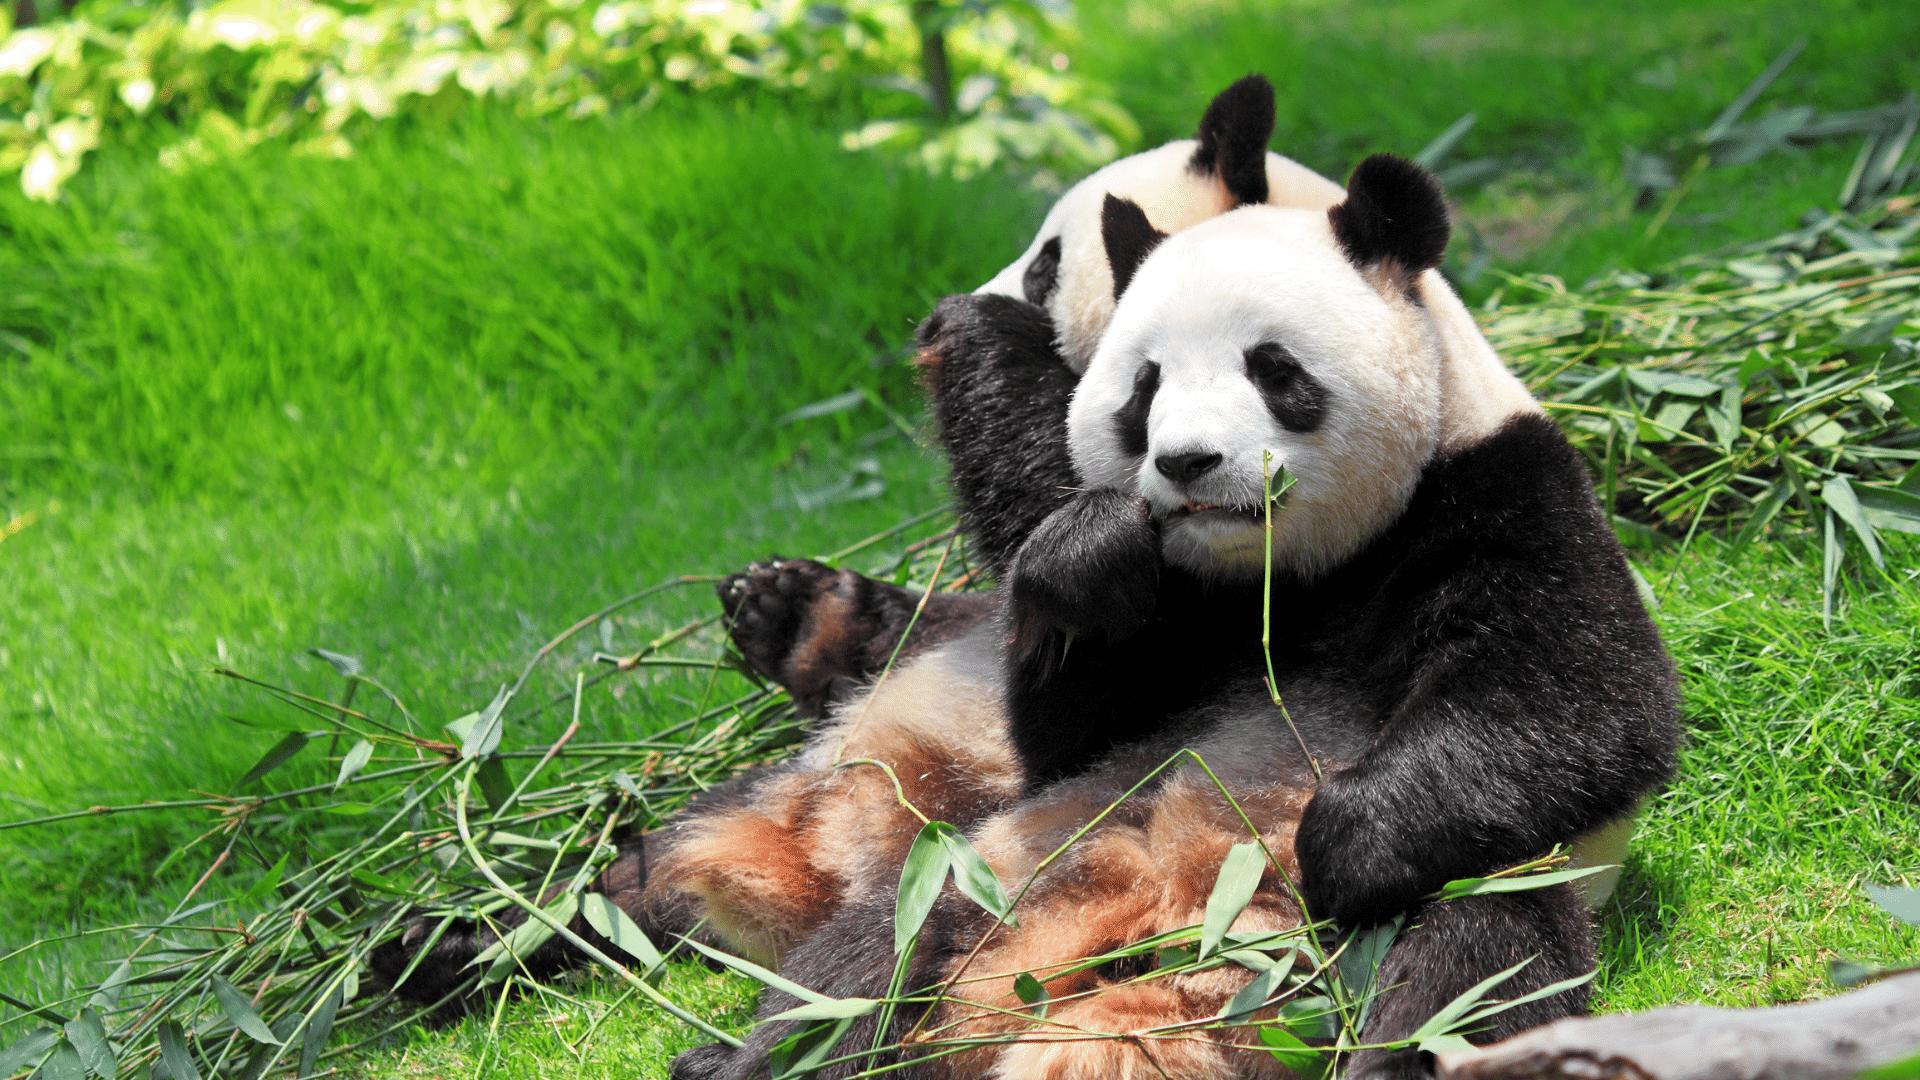 panda no longer endangered